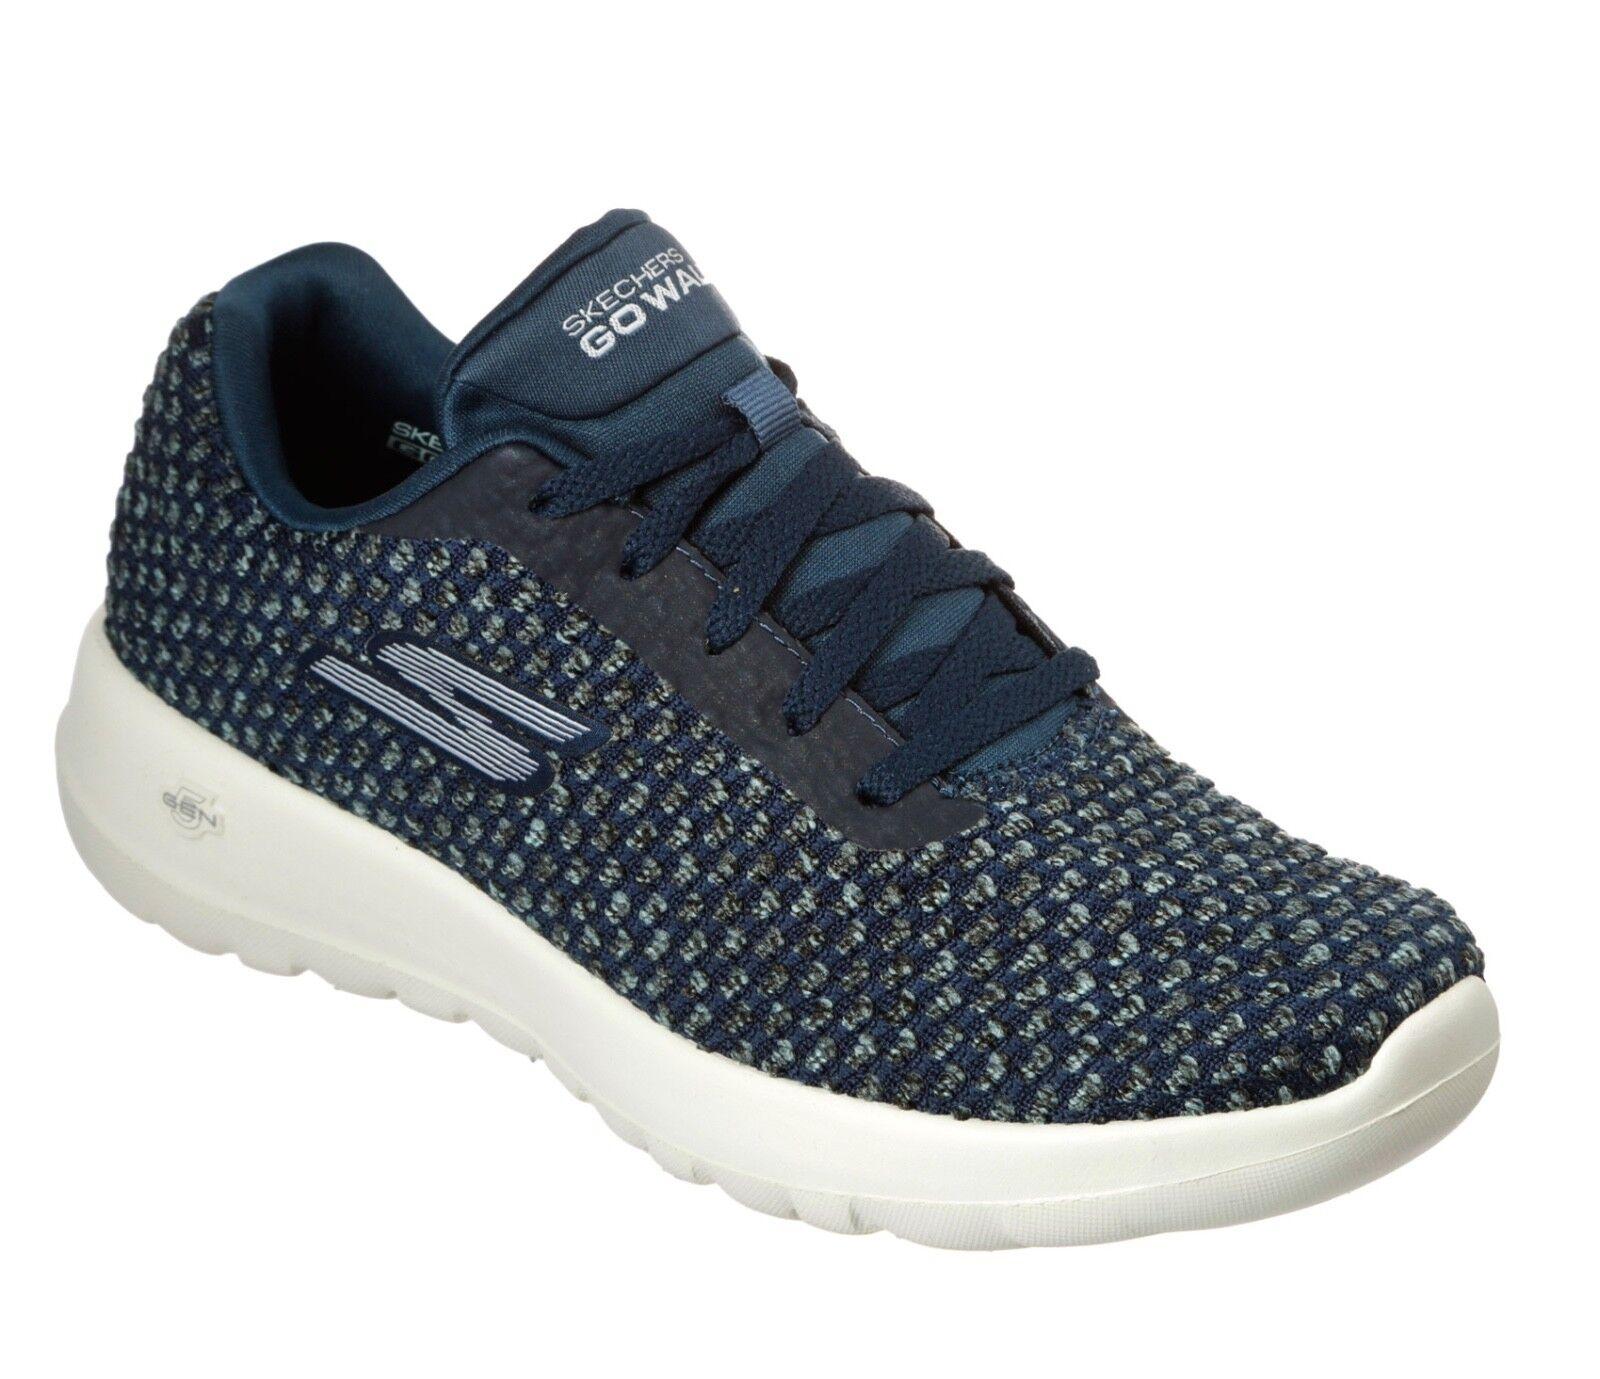 Skechers NEW Go Walk Joy Pivotal teal Damens's comfort fashion trainers Größes 3-8